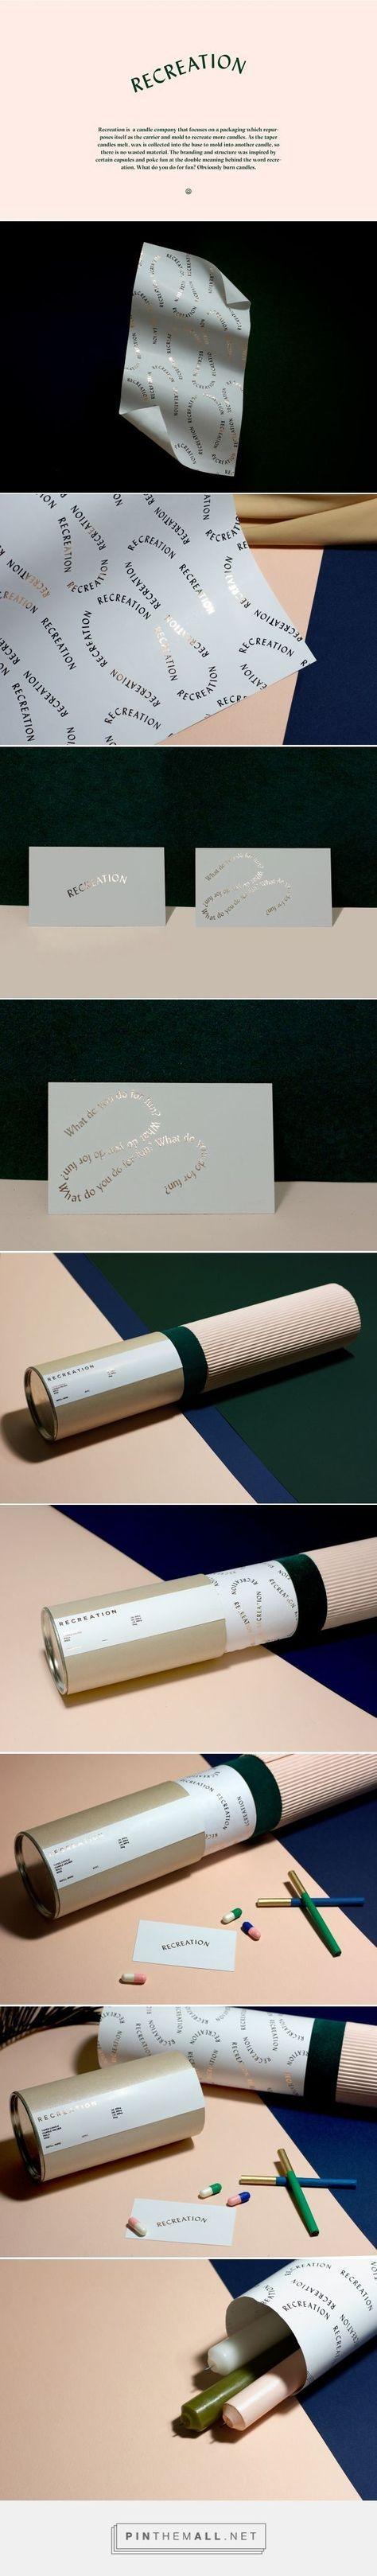 Recreation Branding Foil Identity Stationery